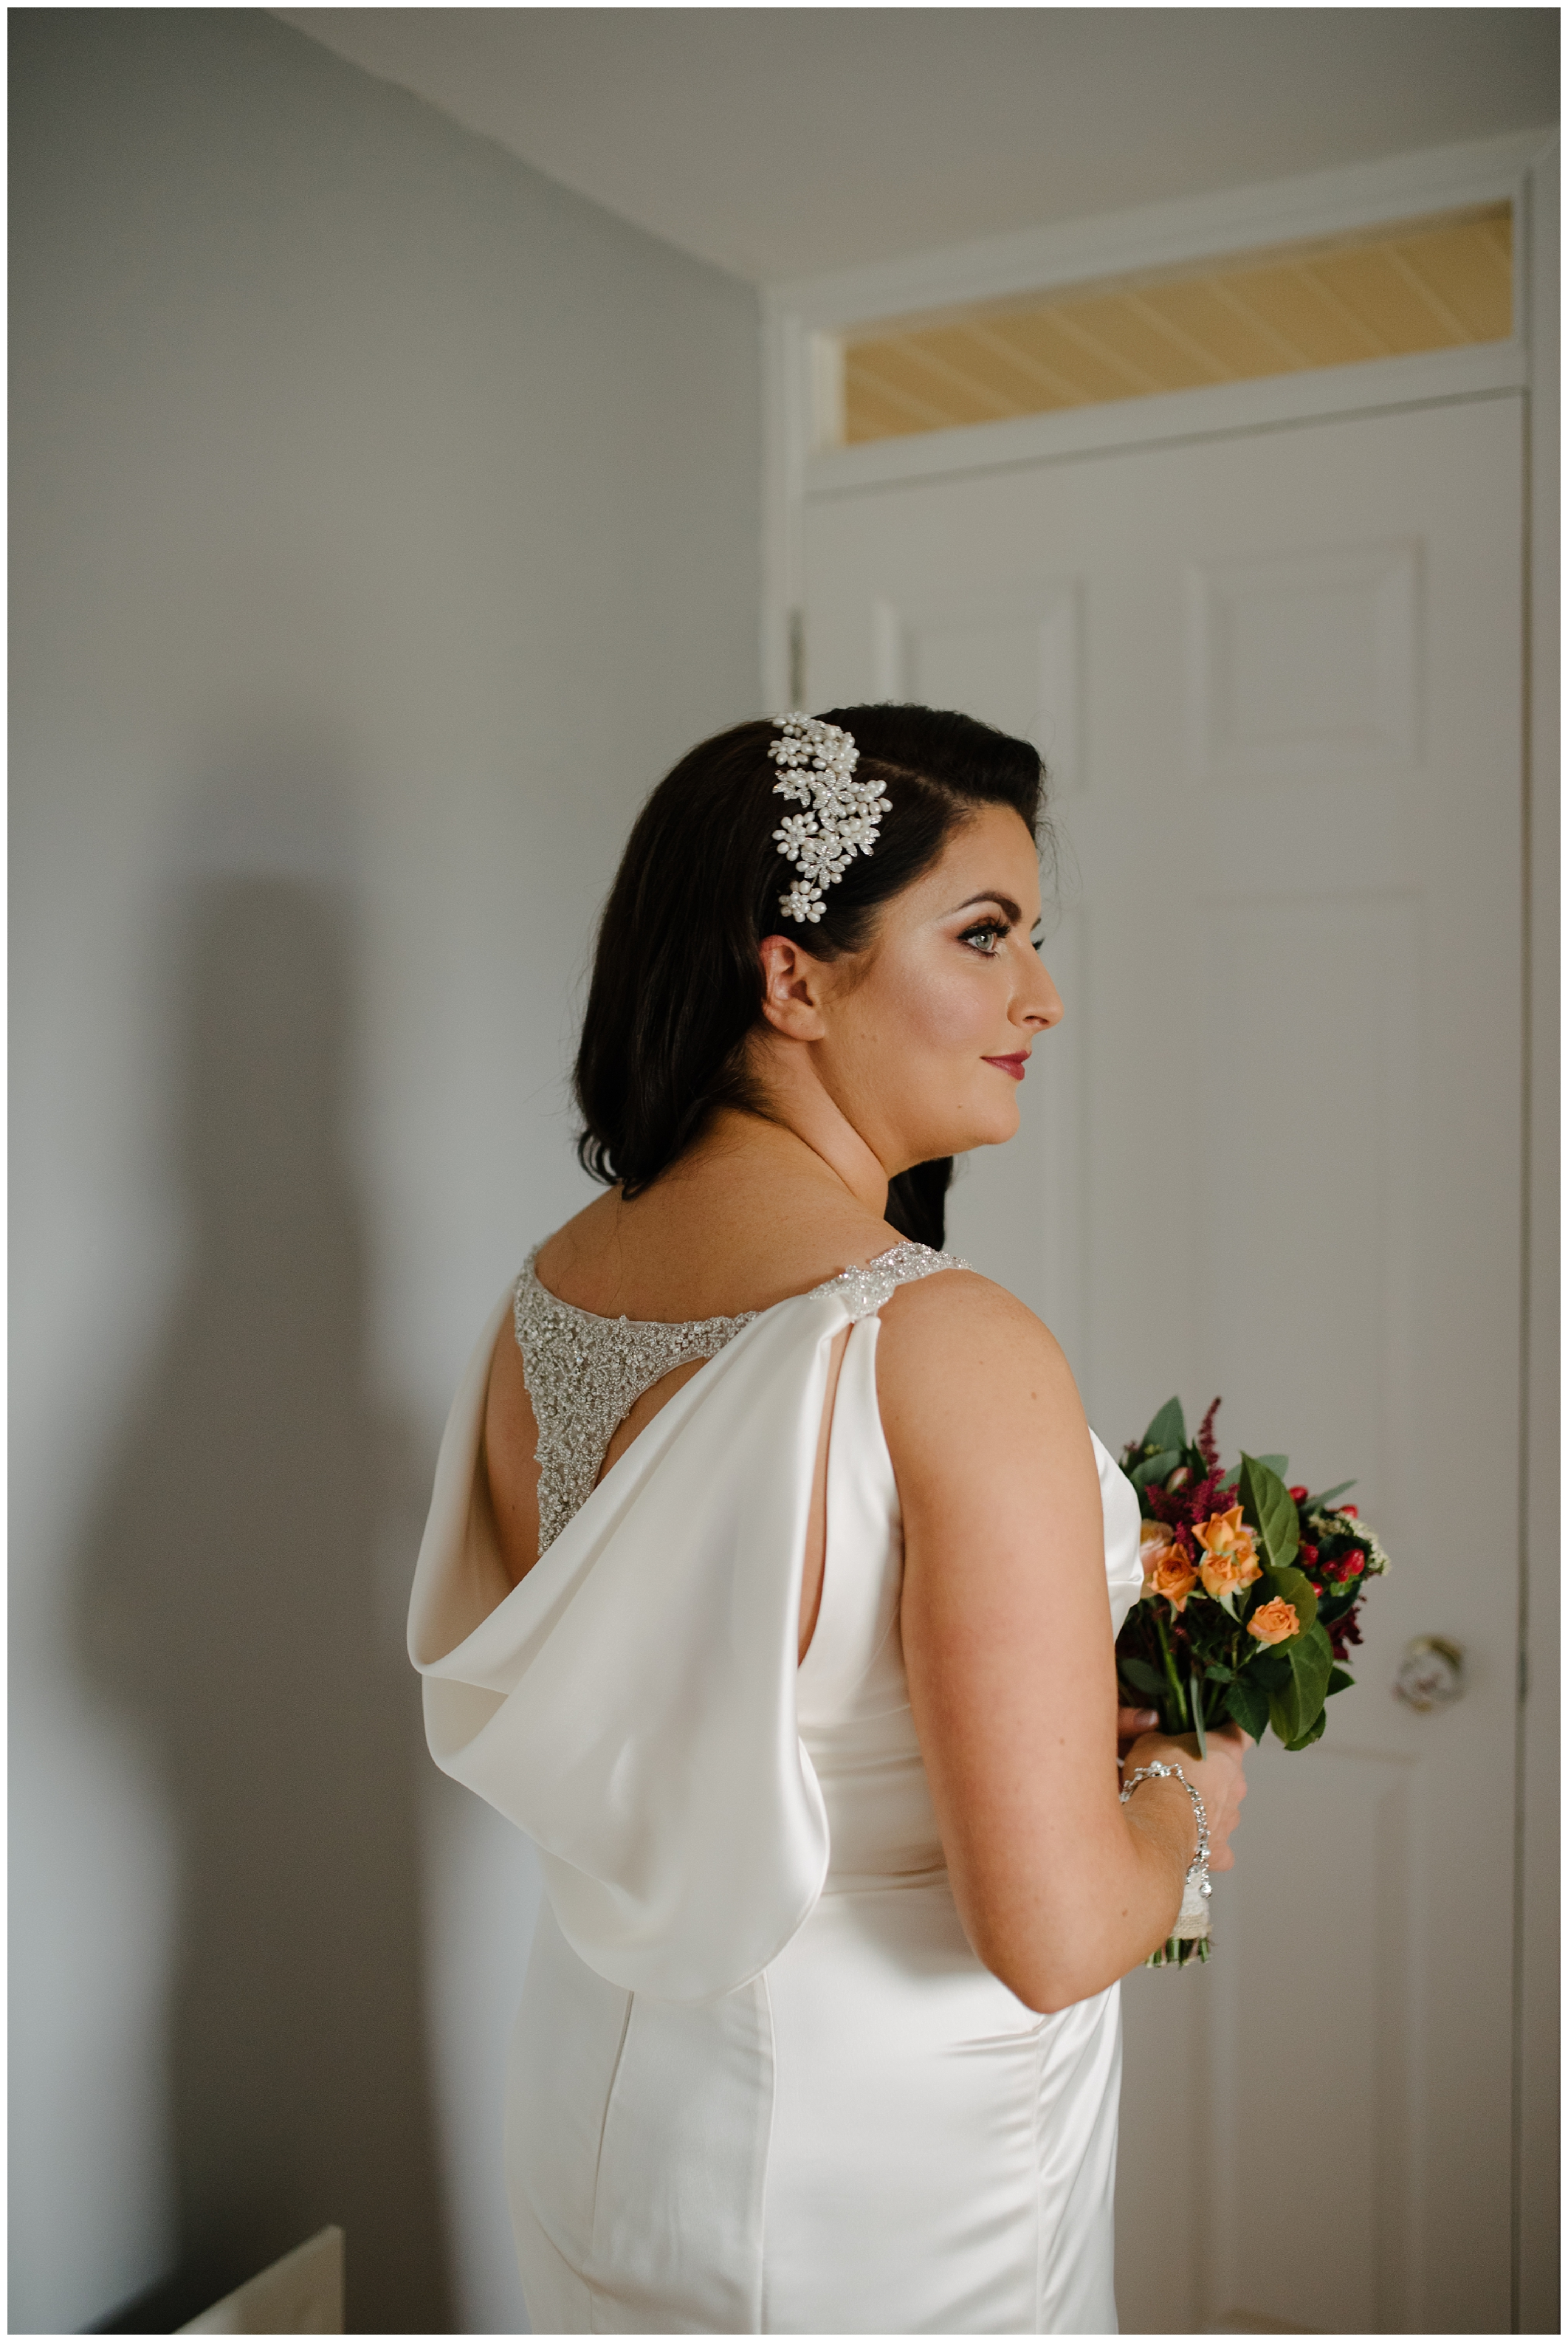 tracey_conor__wedding_jude_browne_photography_0011.jpg